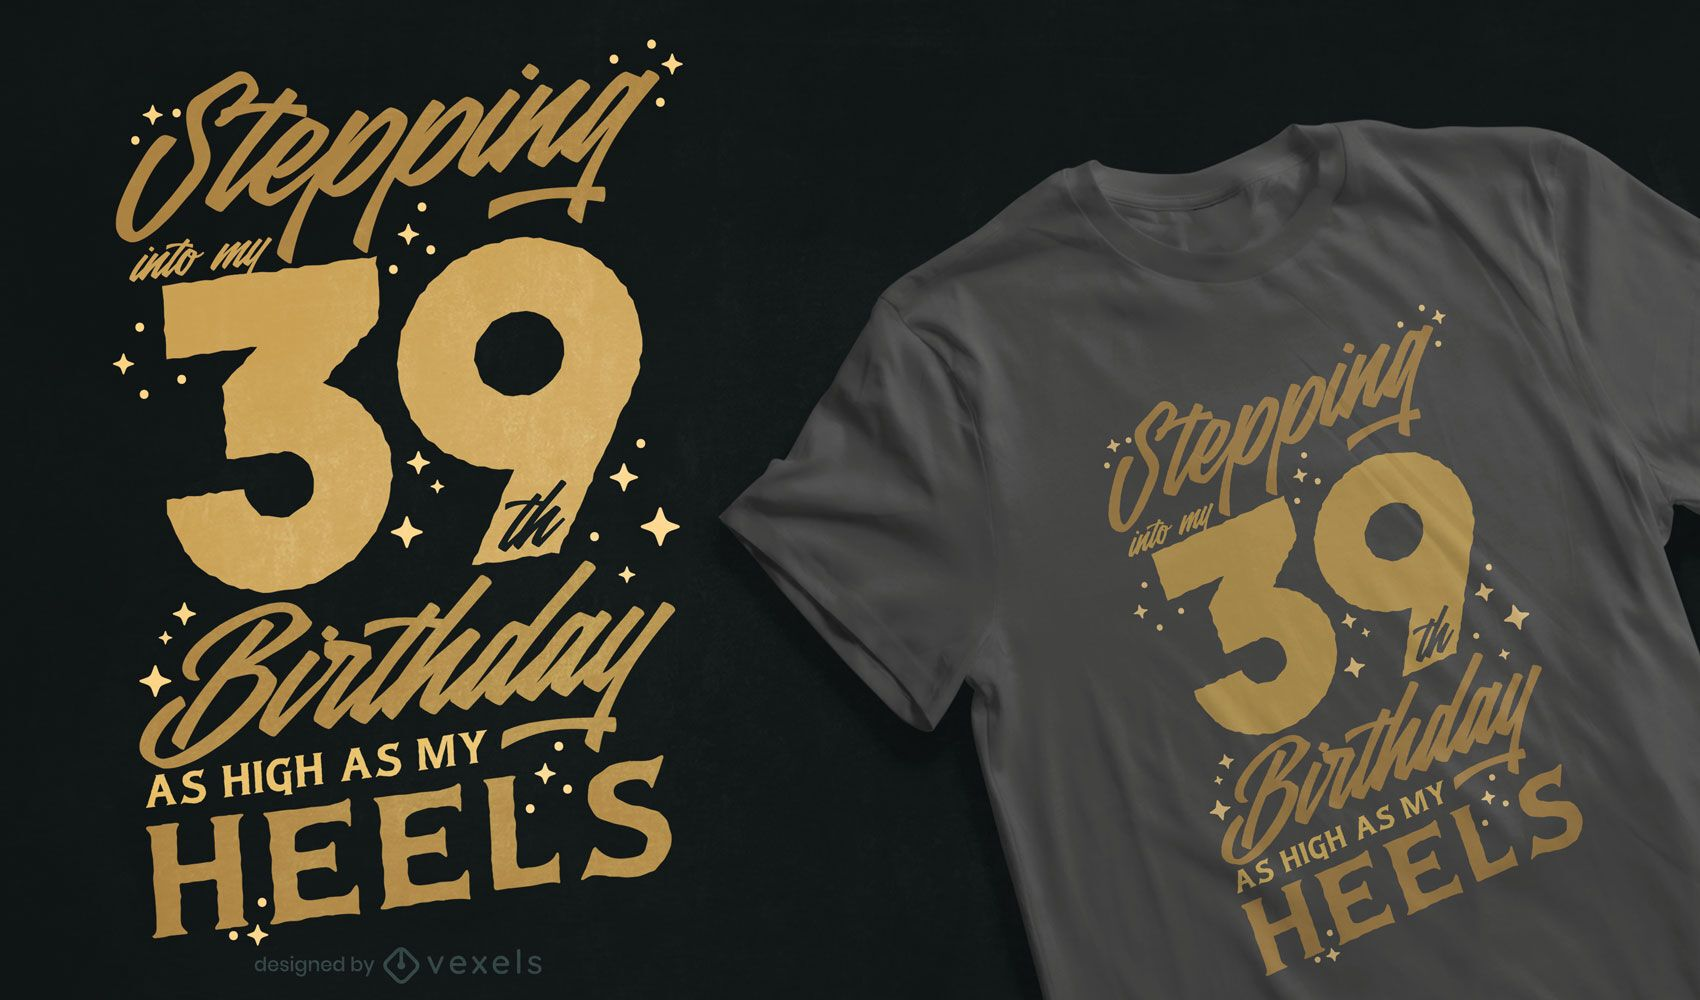 High birthday quote t-shirt design